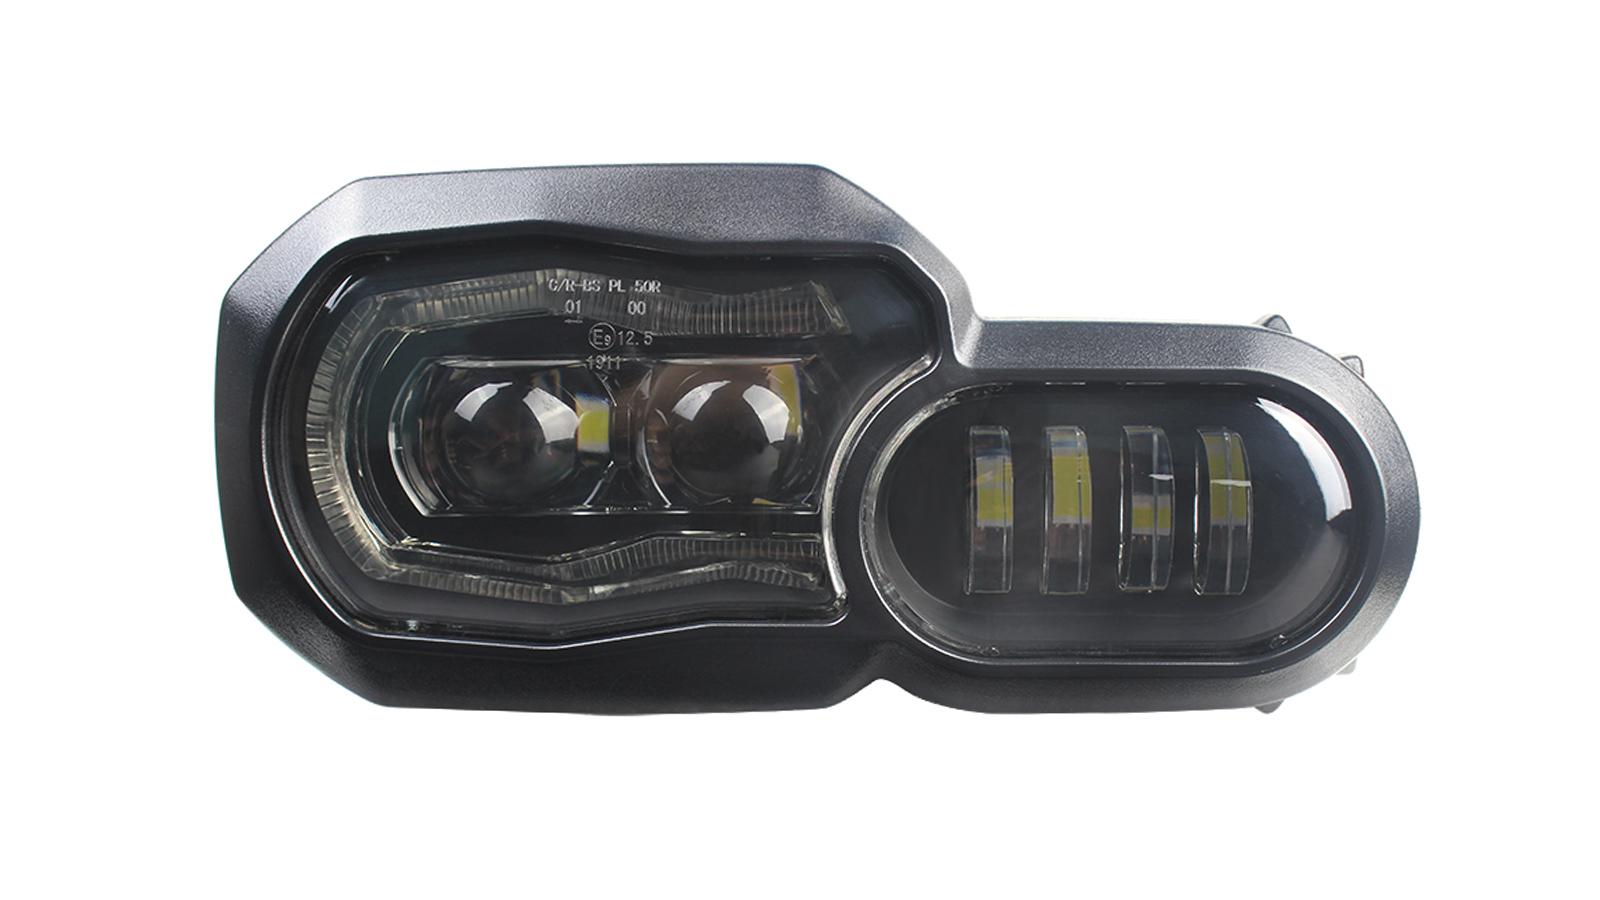 HEARLAMP LED DRL per BMW F800GS F 800 GS F650GS F700GS ADV F800R Motociclo